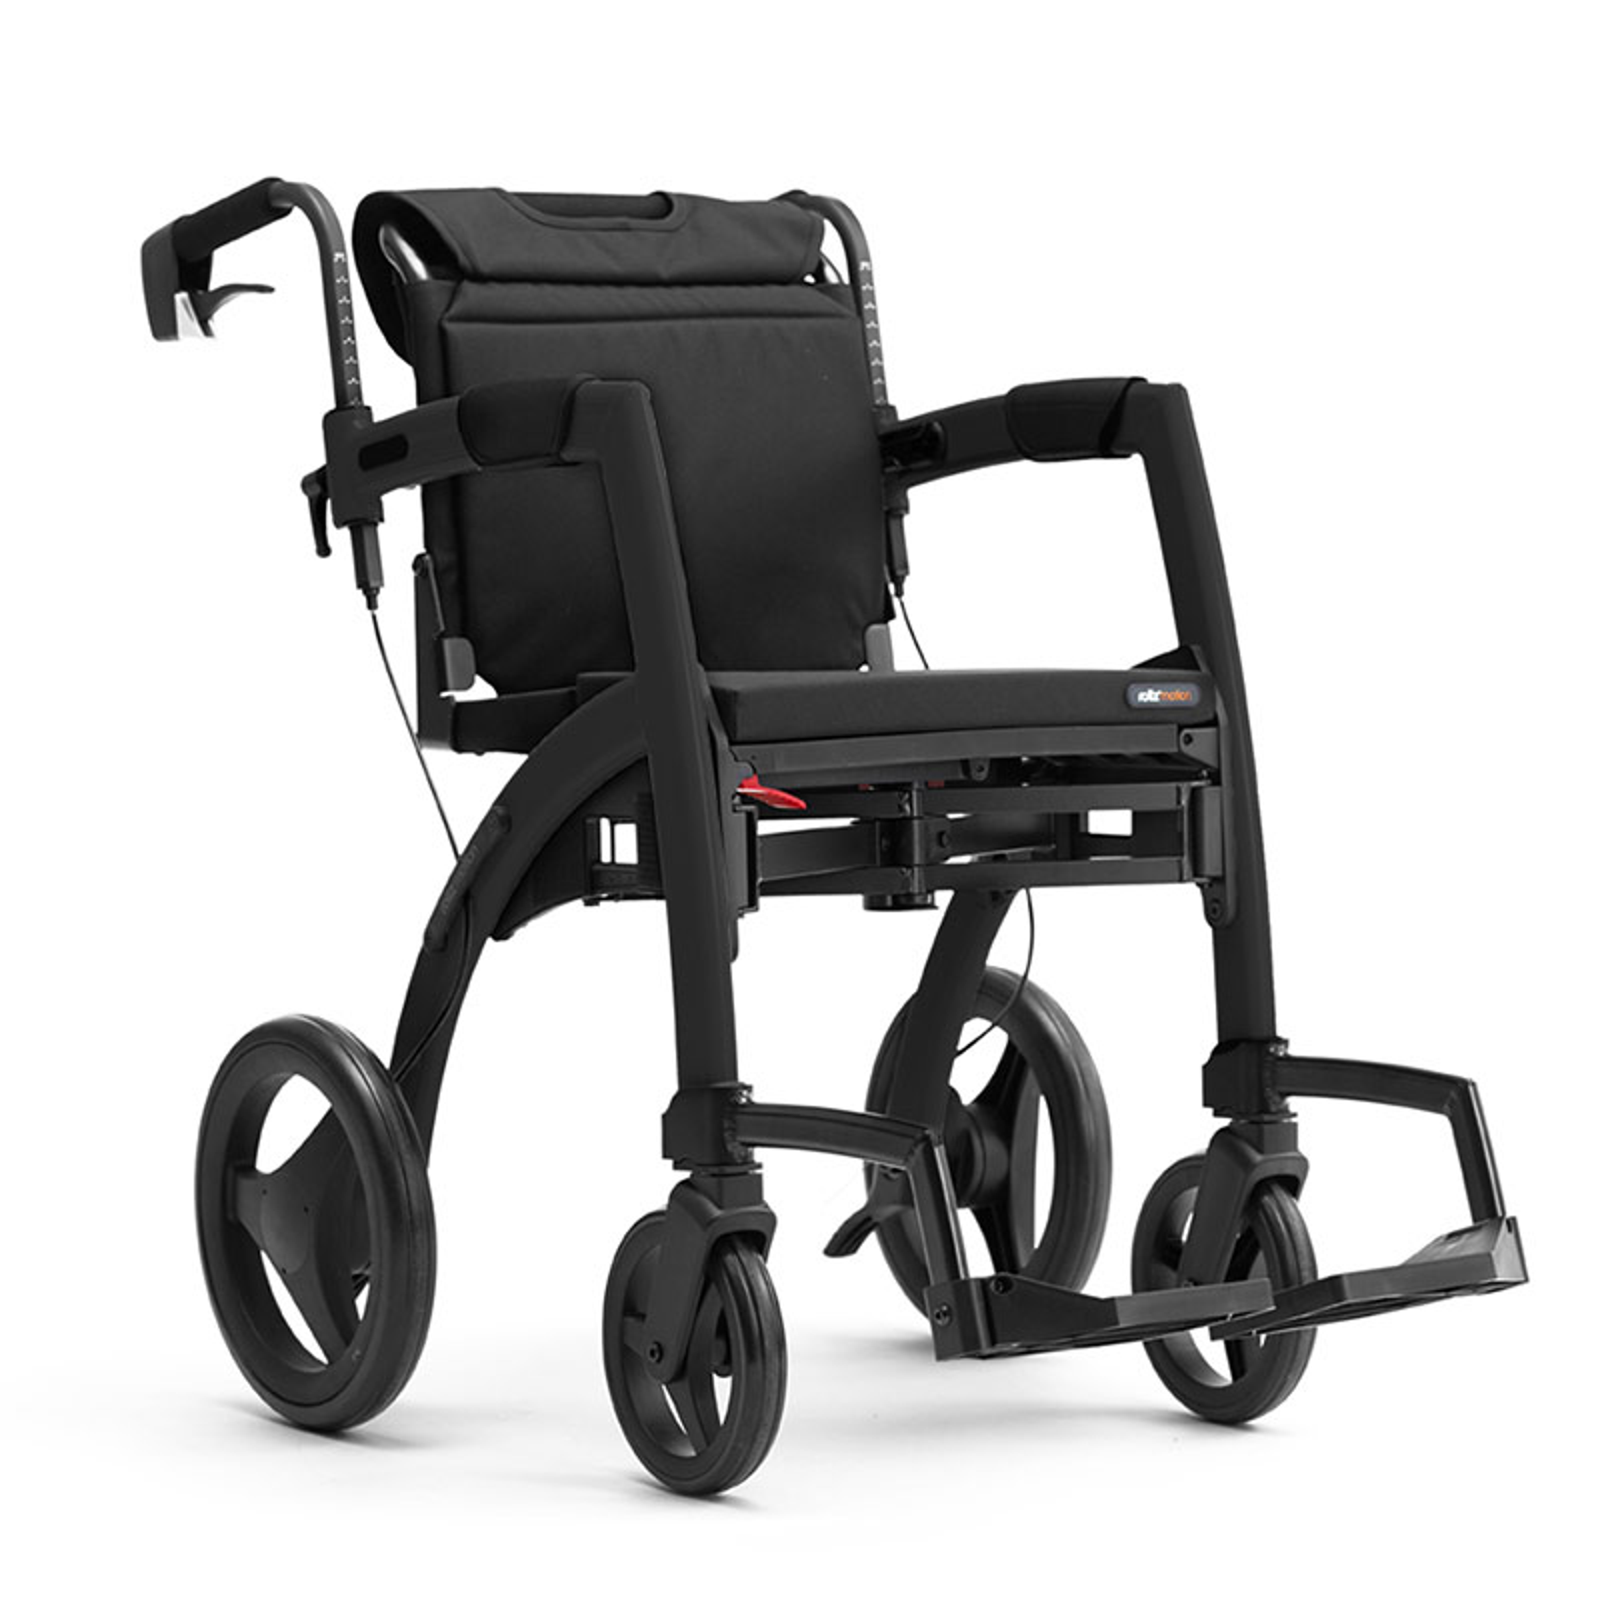 Rollz Motion2 Rollator-Transport chair